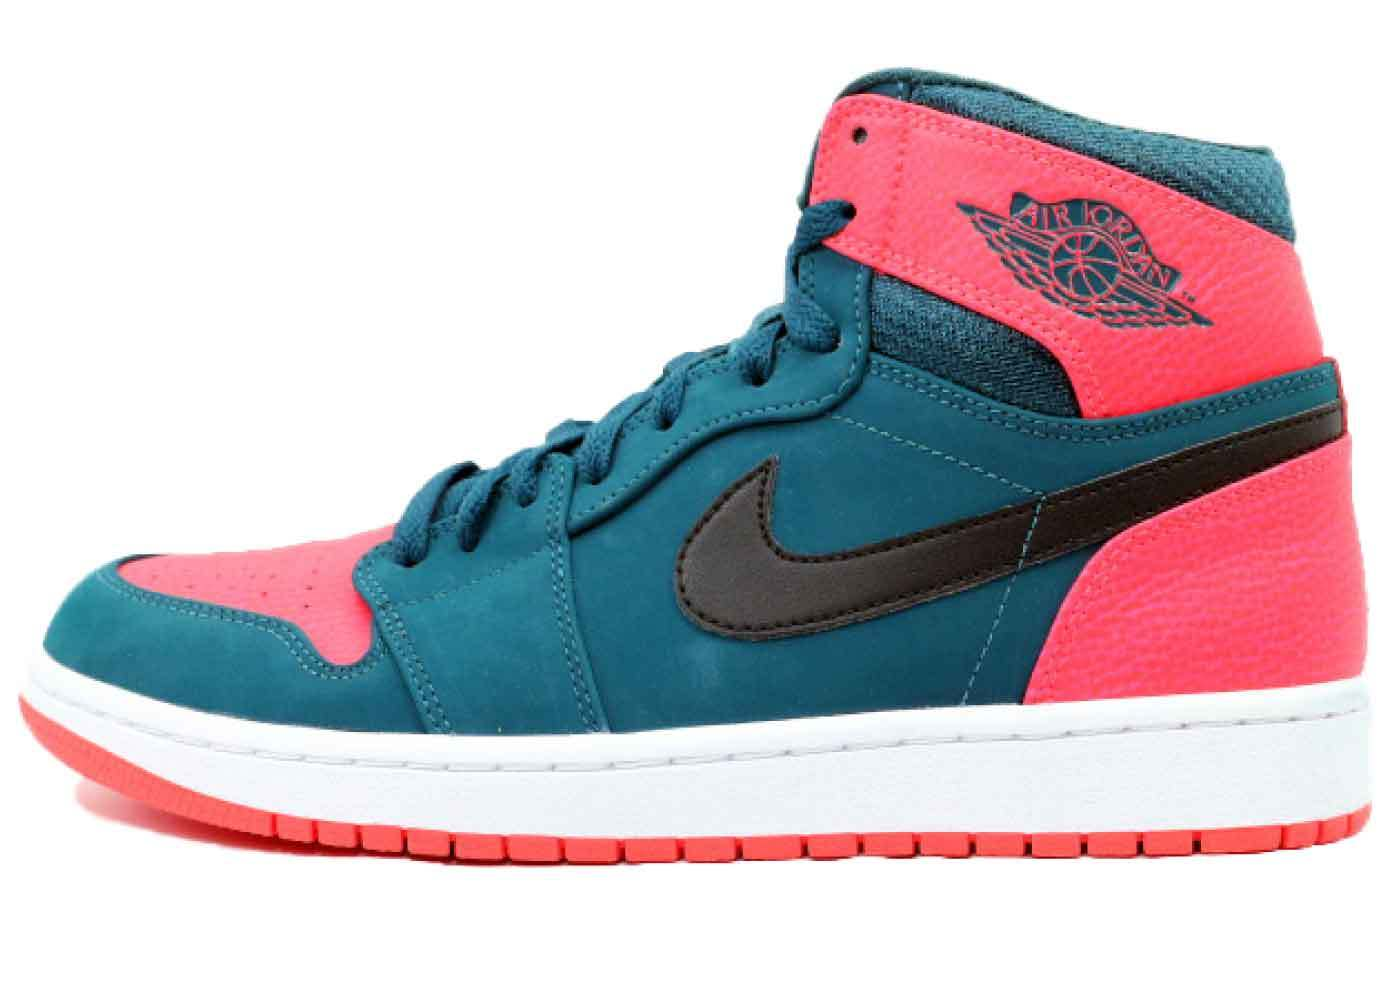 Nike Air Jordan 1 Retro Russell Westbrook PEの写真